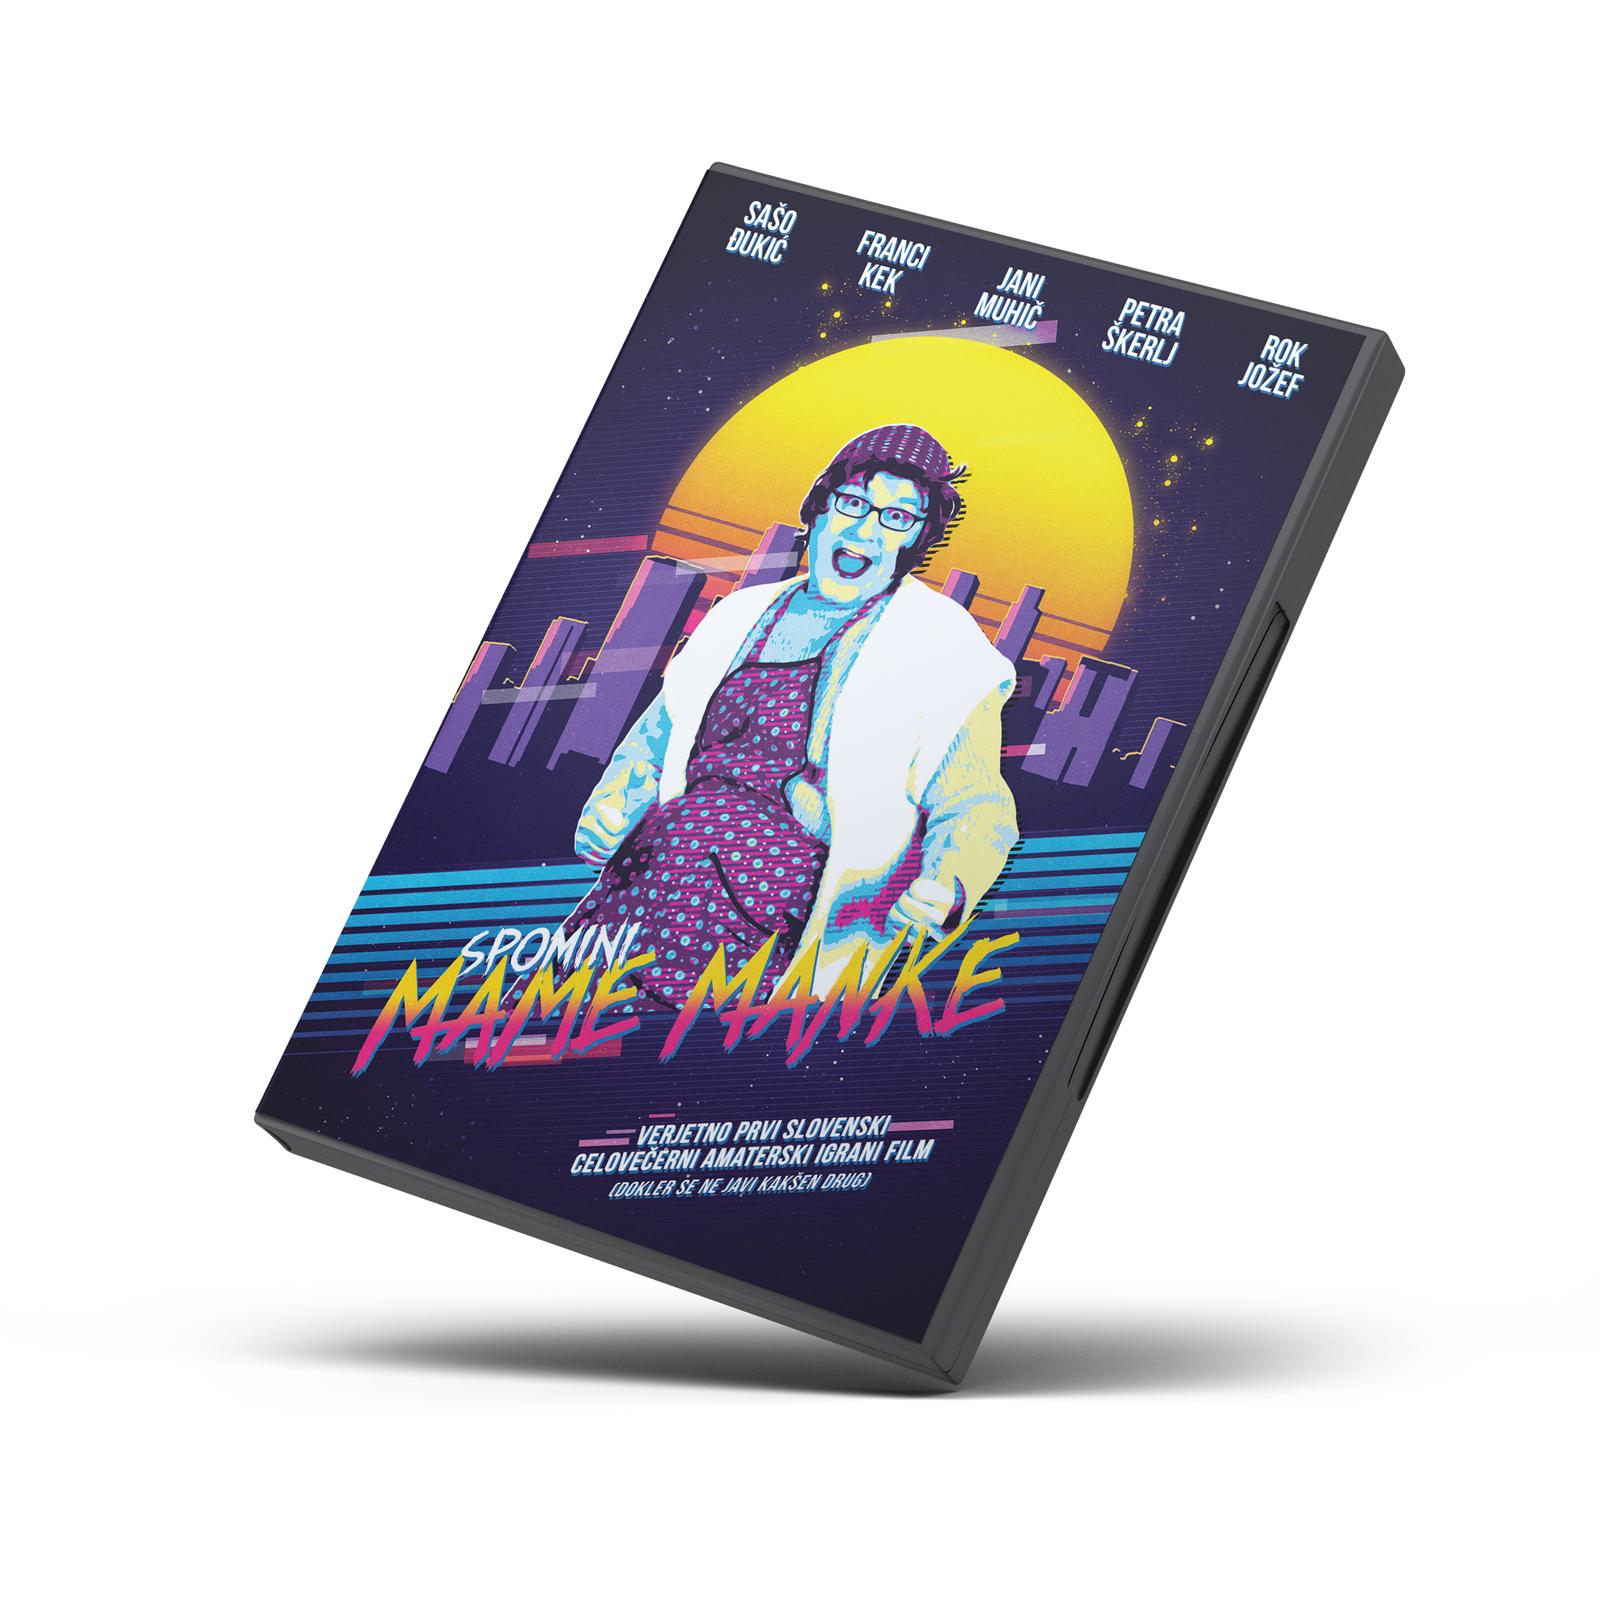 Spomini mame Manke